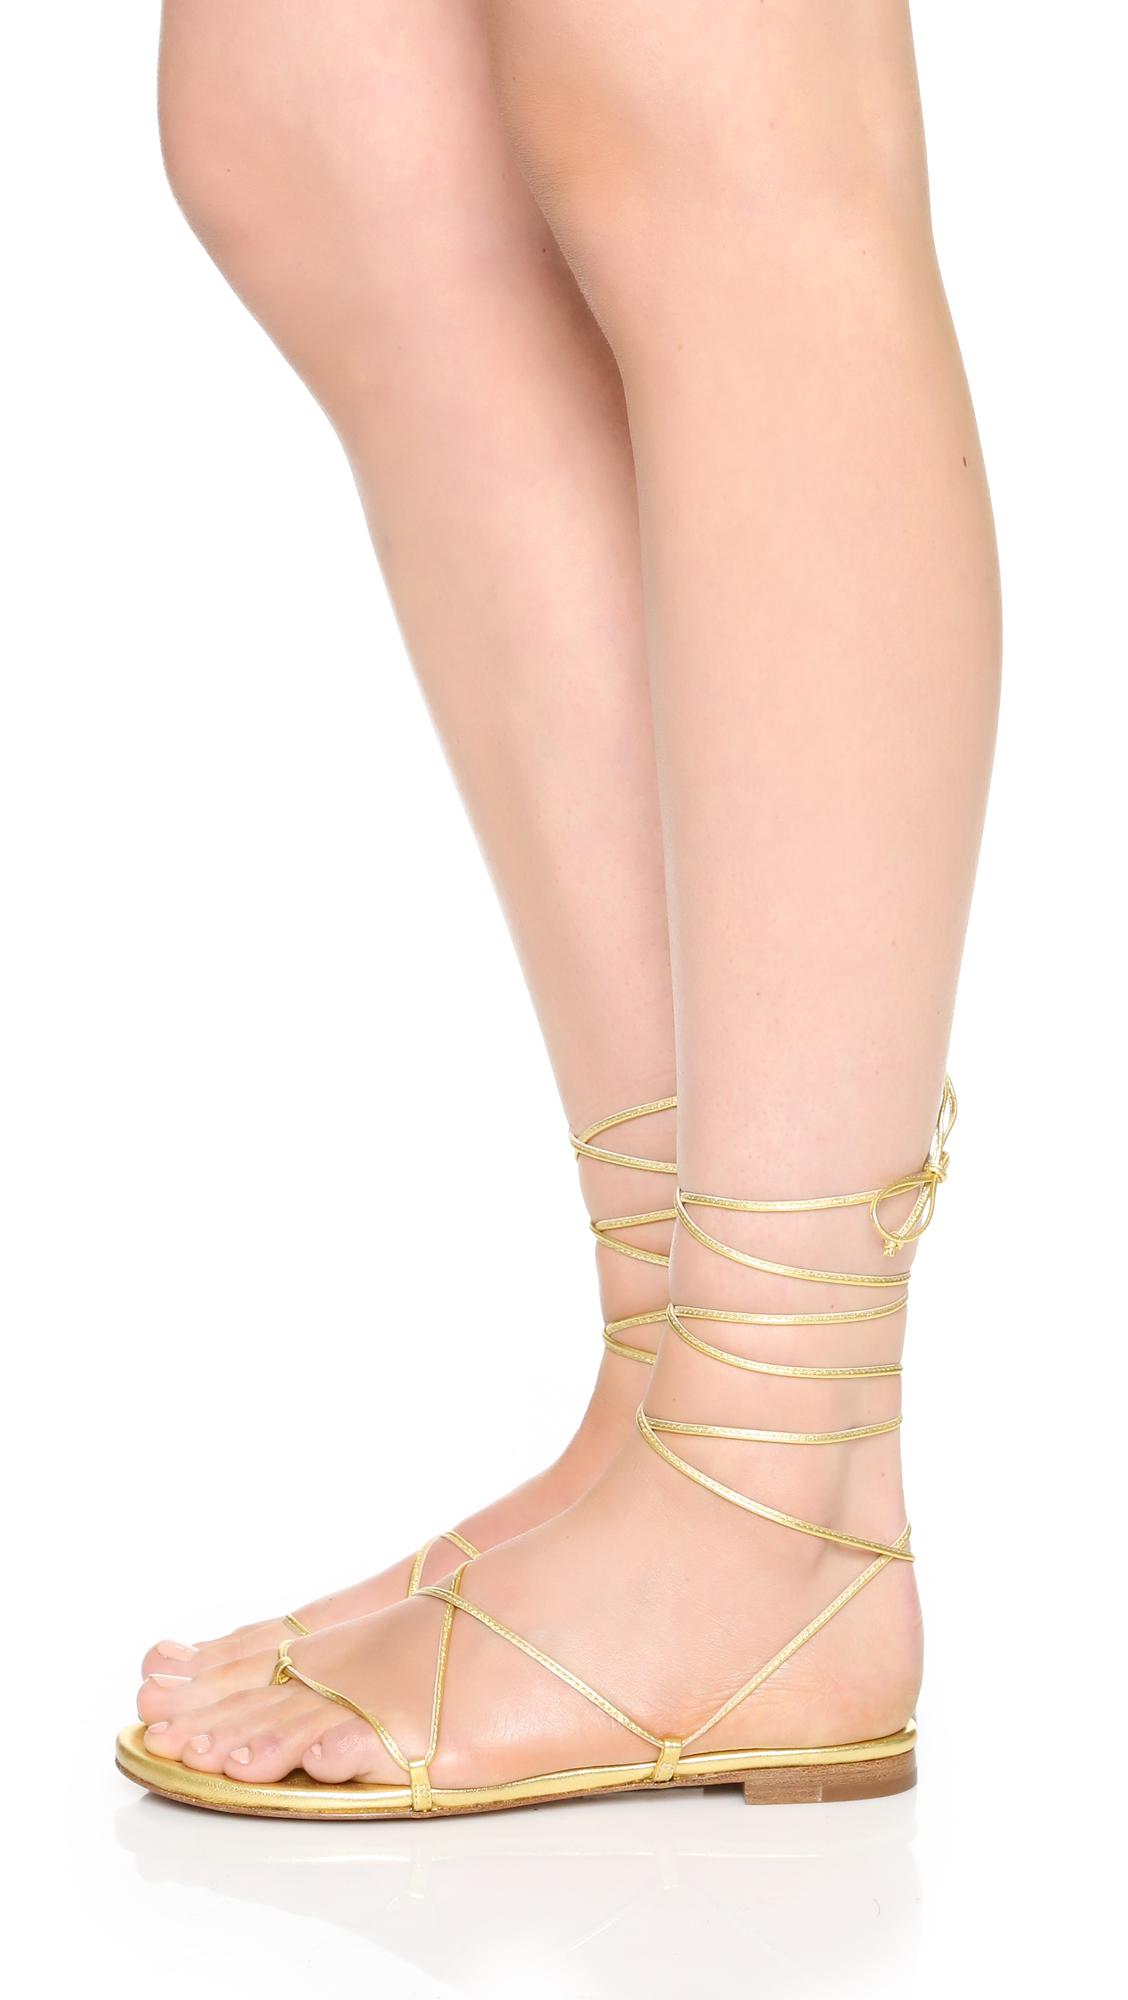 88eabf299ed7 Michael Kors Collection Bradshaw Lace Up Sandals